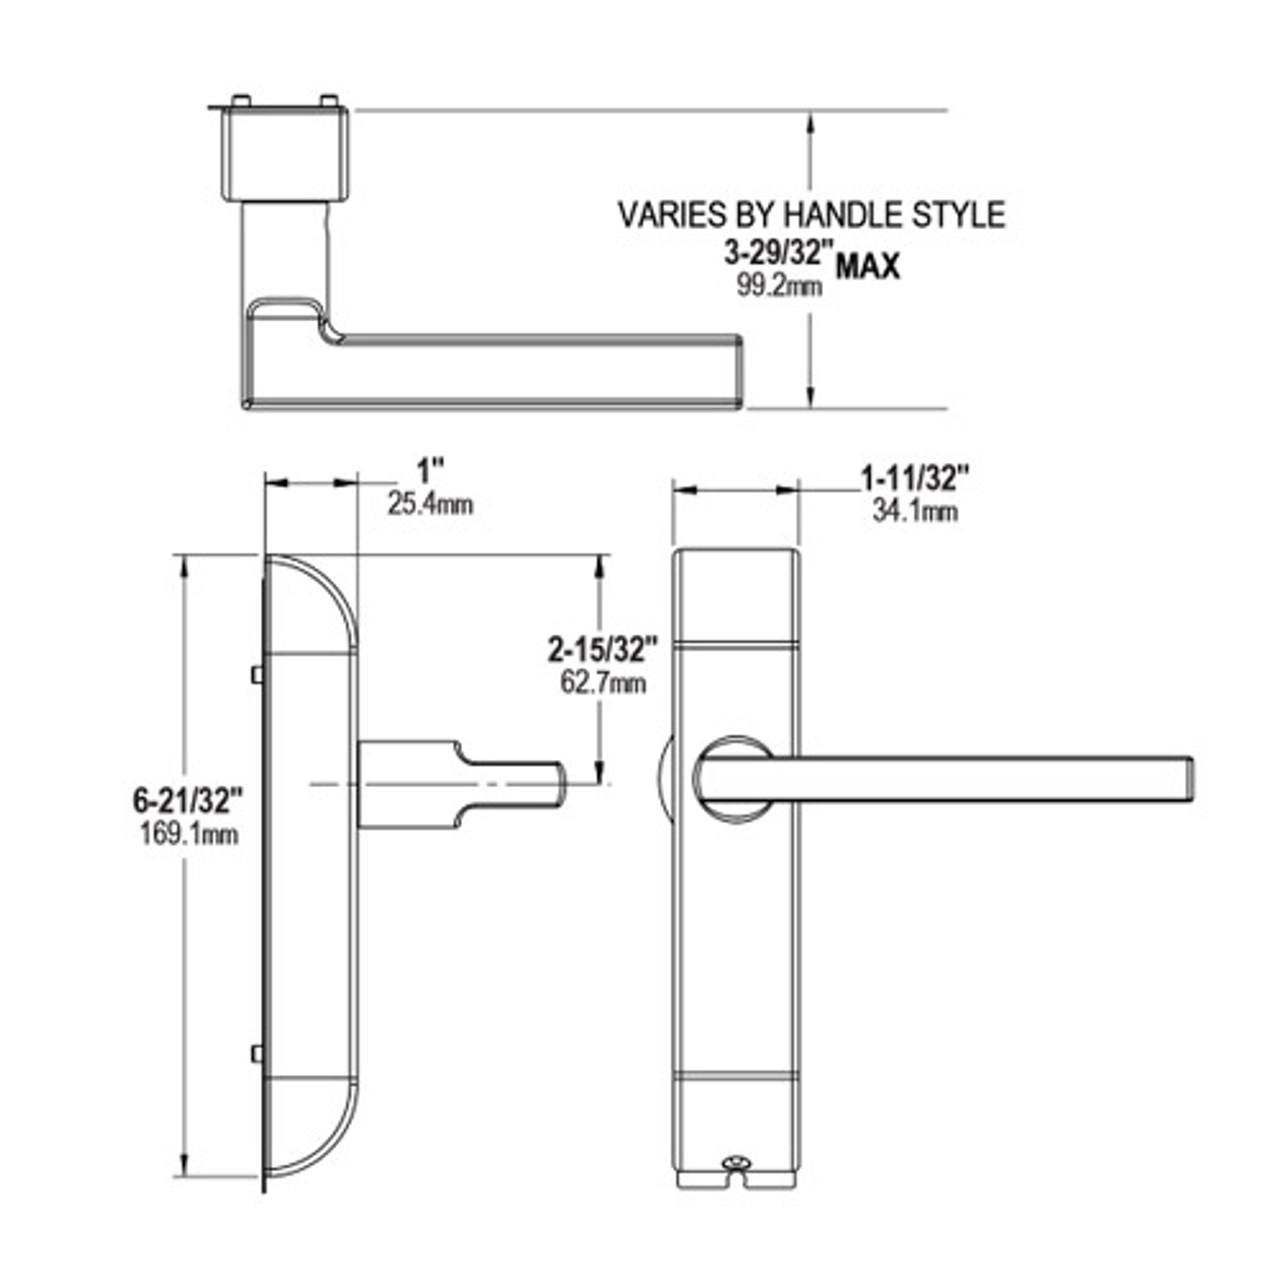 4600-MI-532-US4 Adams Rite MI Designer handle Dimensional View